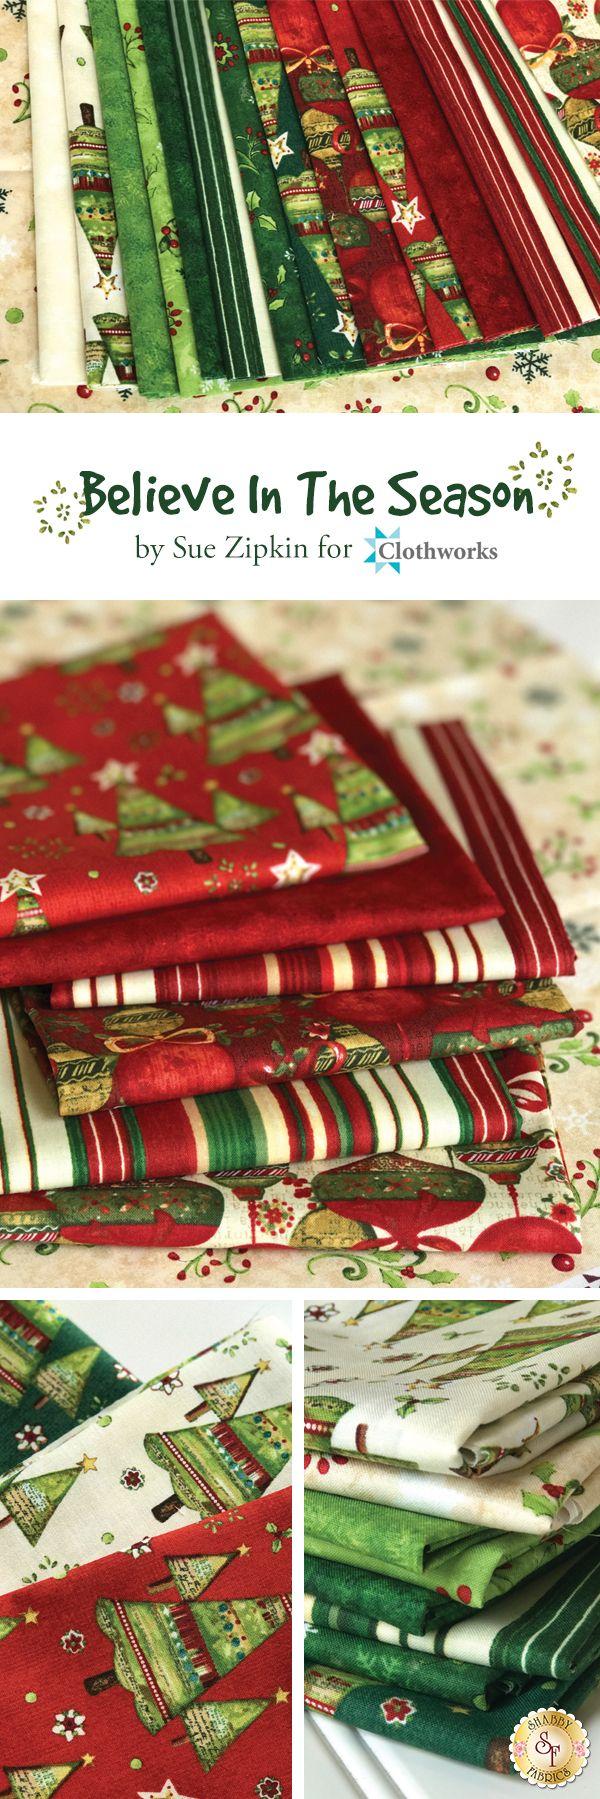 316 best images about telas fabrics telas on pinterest - Telas shabby chic ...